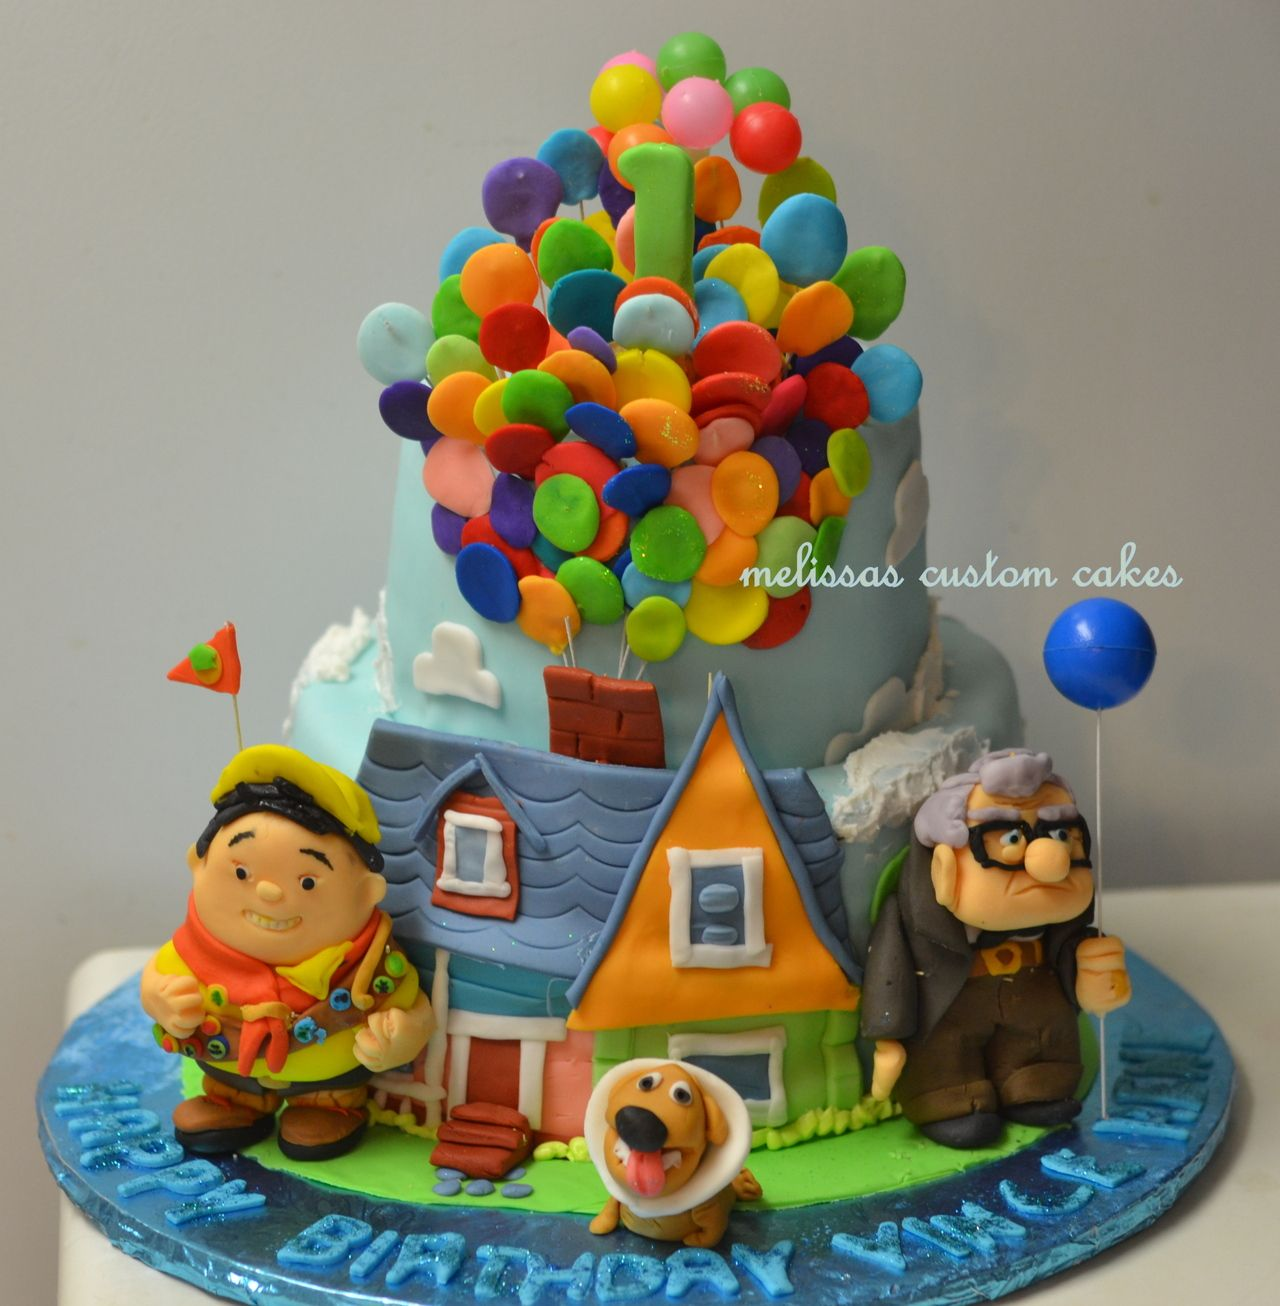 Disney Pixar UP inspired cake. All about Sugar Art ...